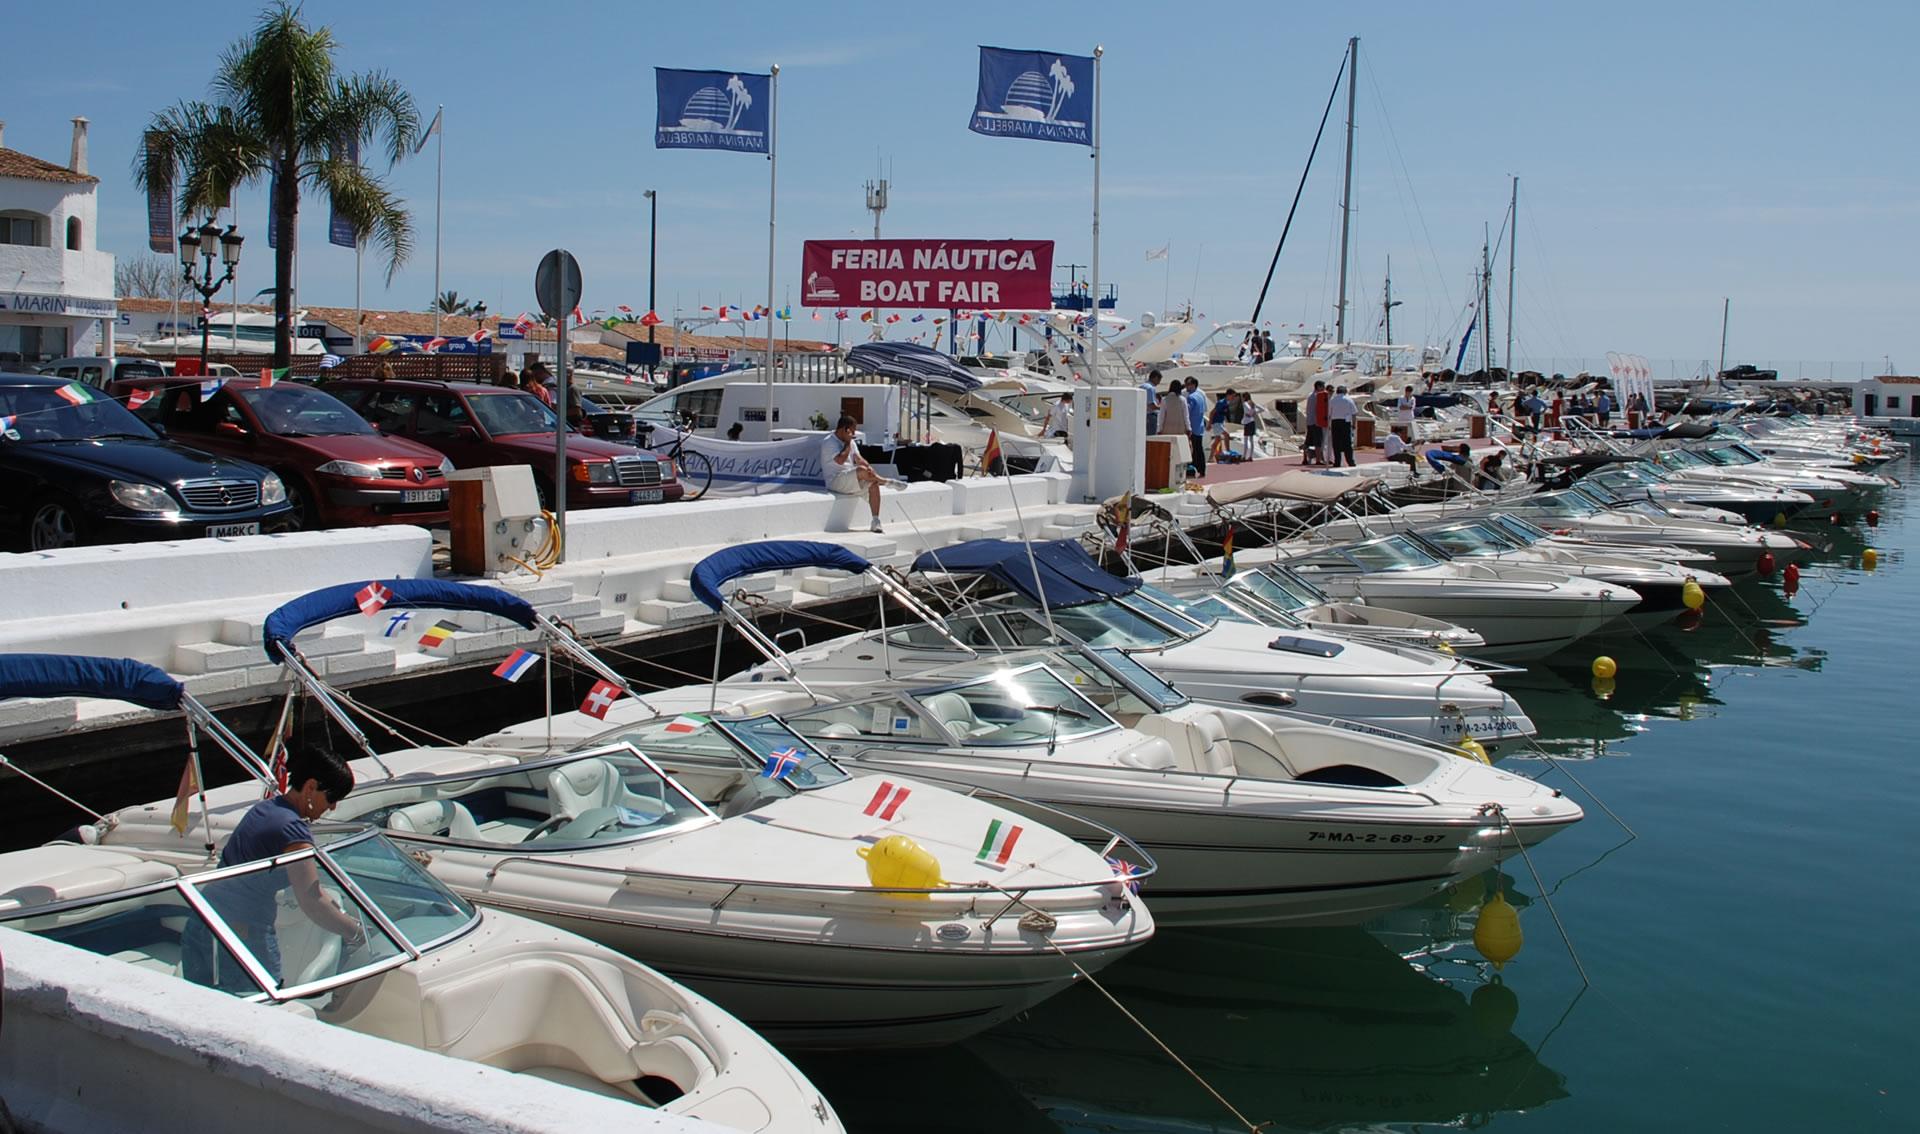 Pre-Owned Boat Show in Puerto Banús, Marbella